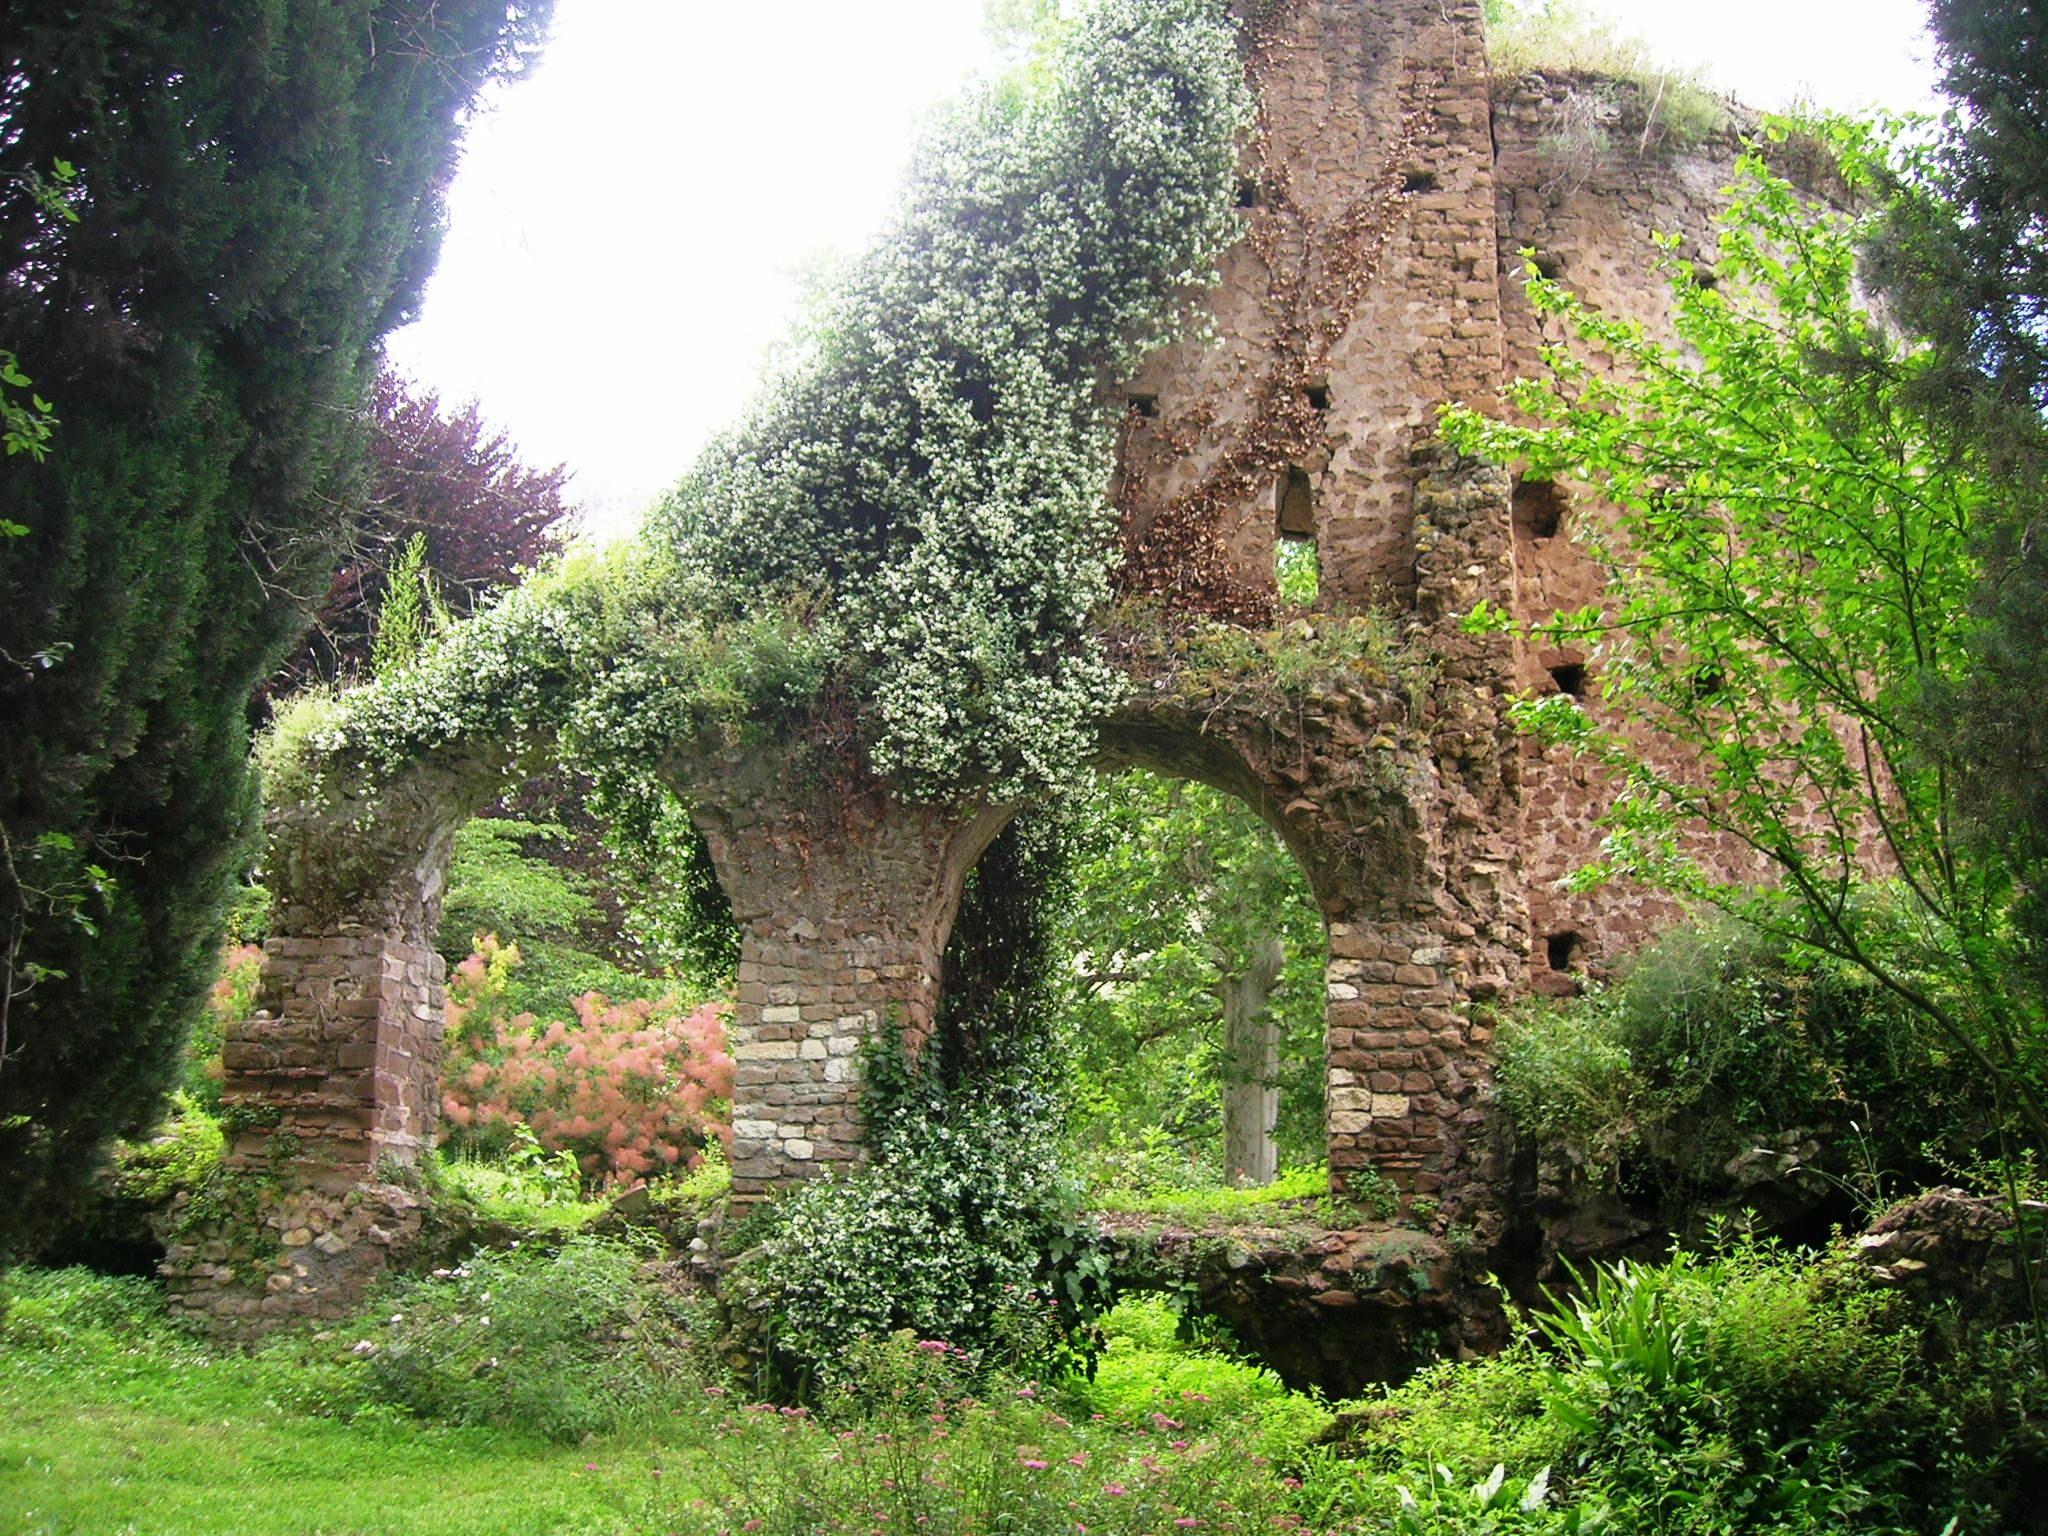 Giardini di ninfa cisterna di latina latina province - I giardini di alice latina lt ...